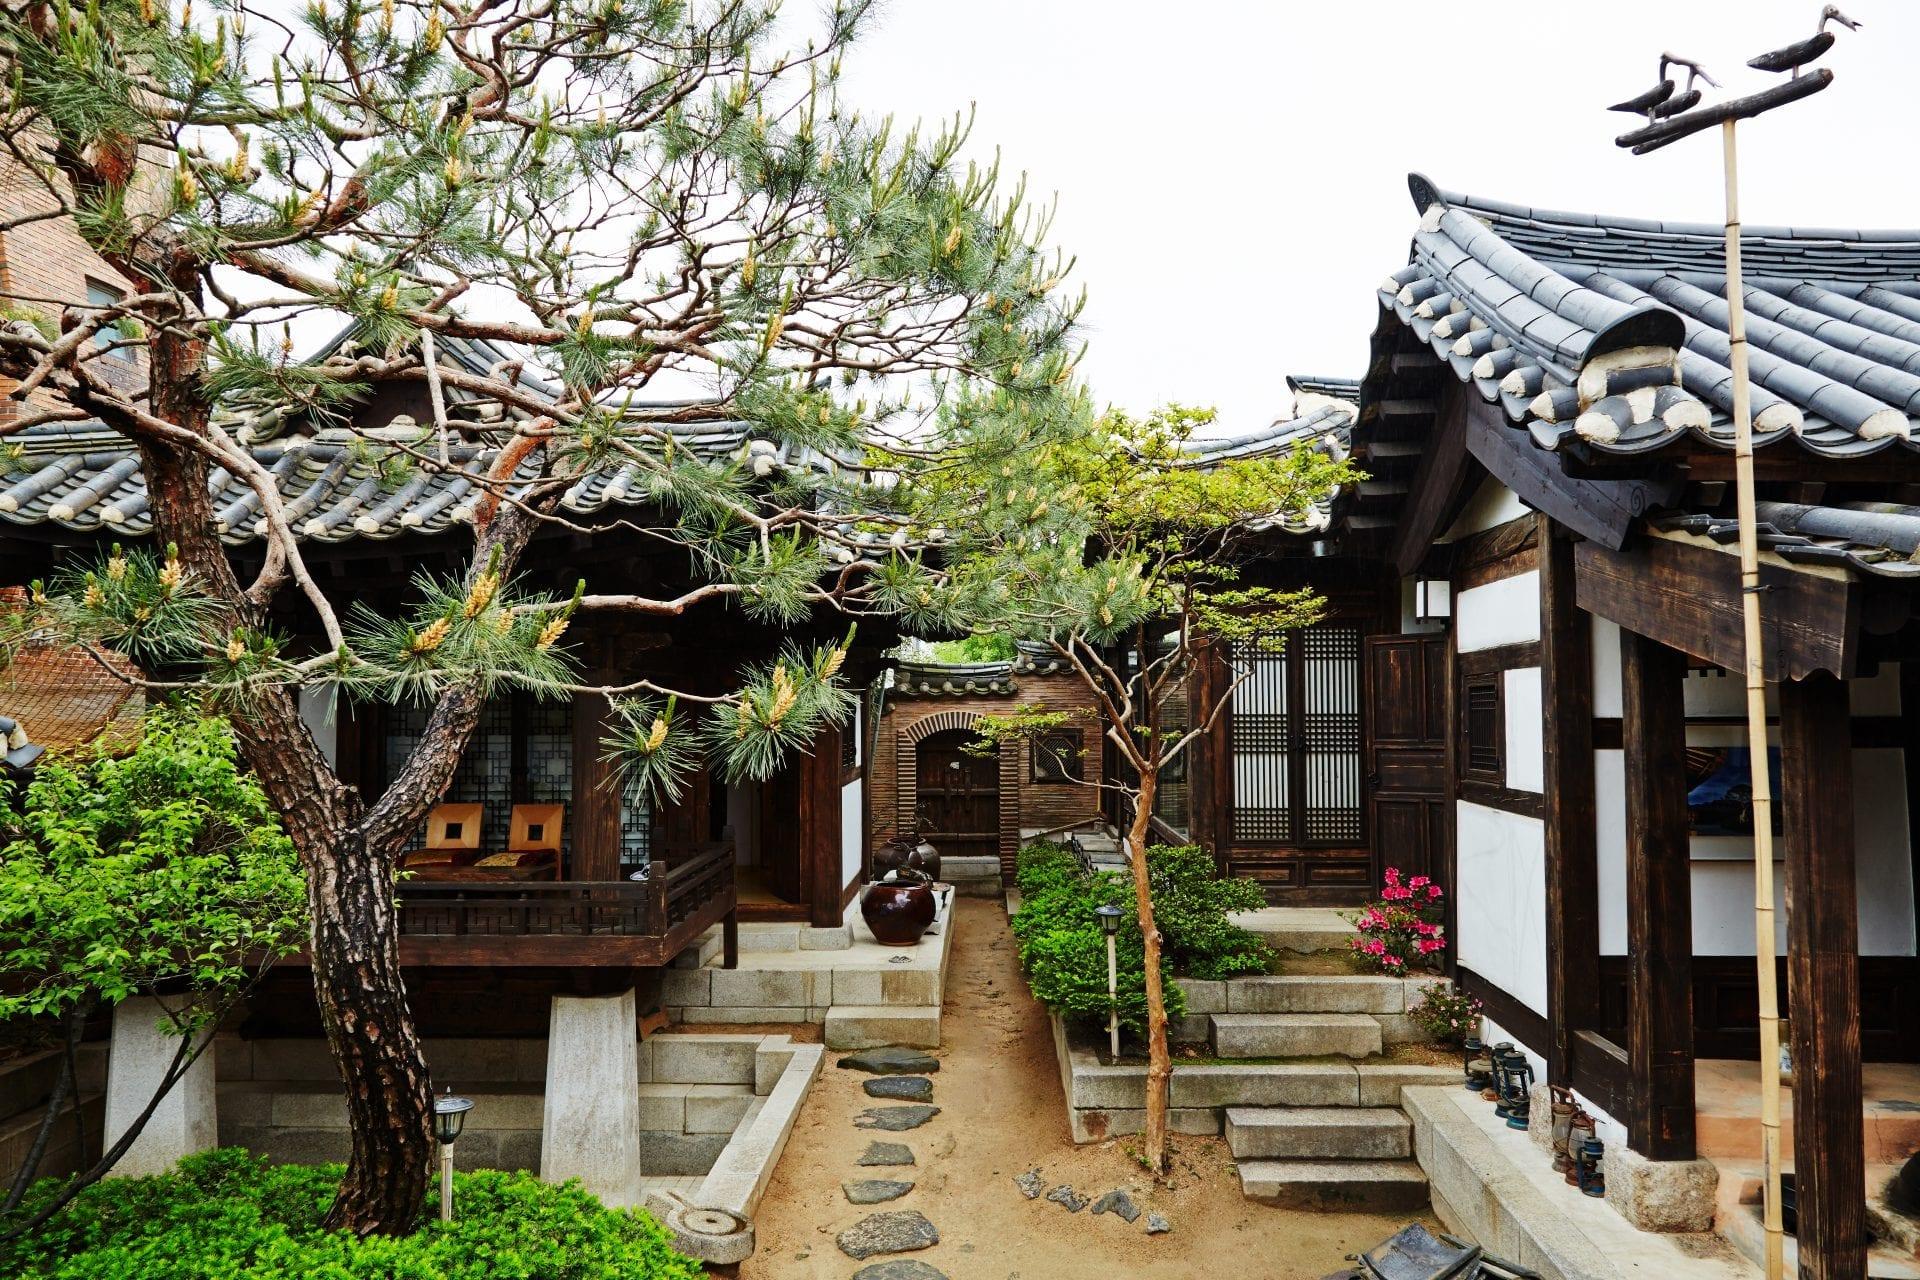 Rakkojae Traditional Hotel | Jongno-gu, Seoul